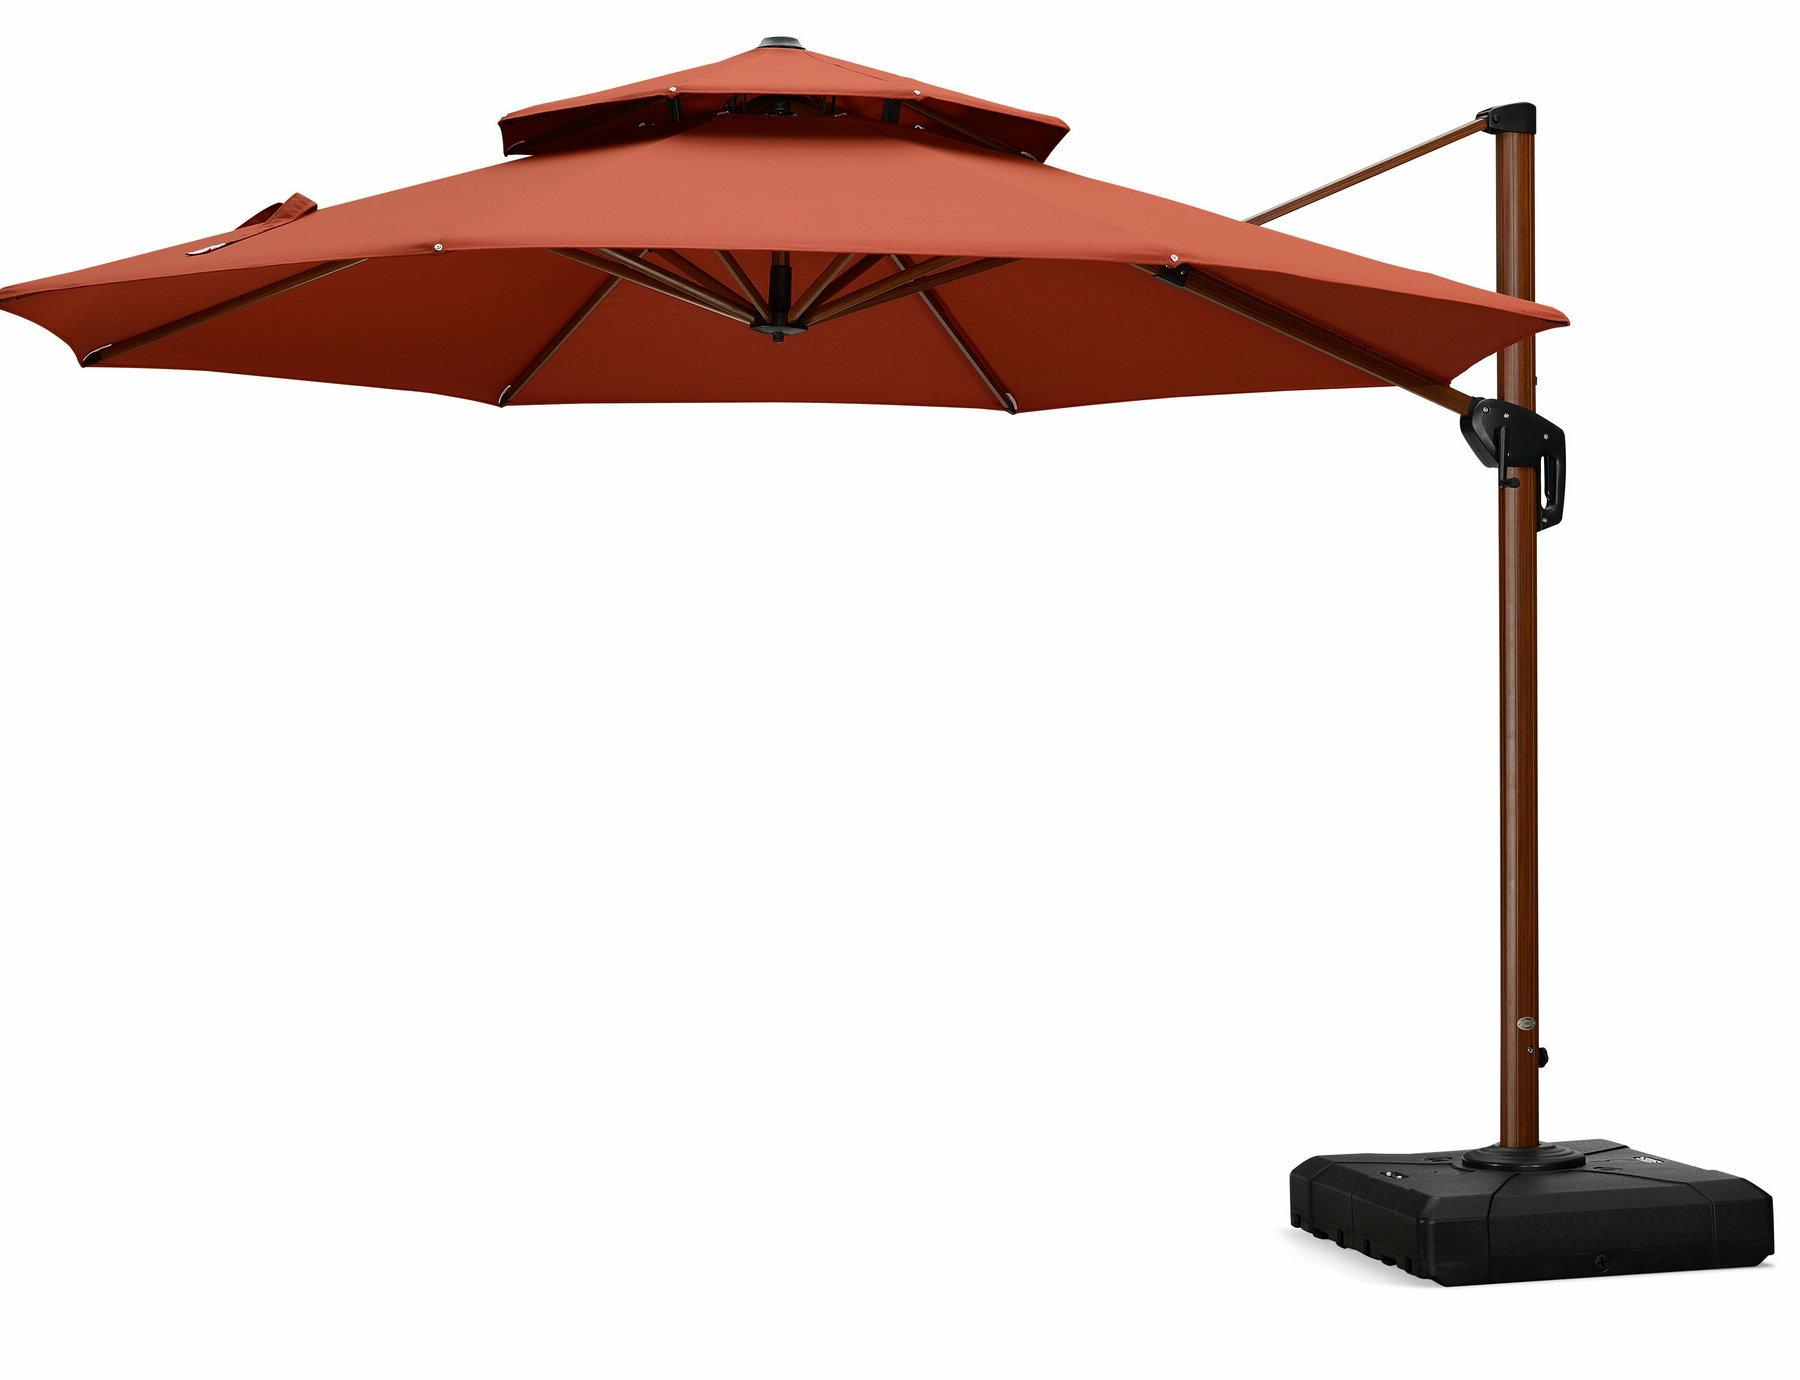 Current Vogt 11' Cantilever Umbrella Throughout Lytham Cantilever Umbrellas (View 6 of 20)